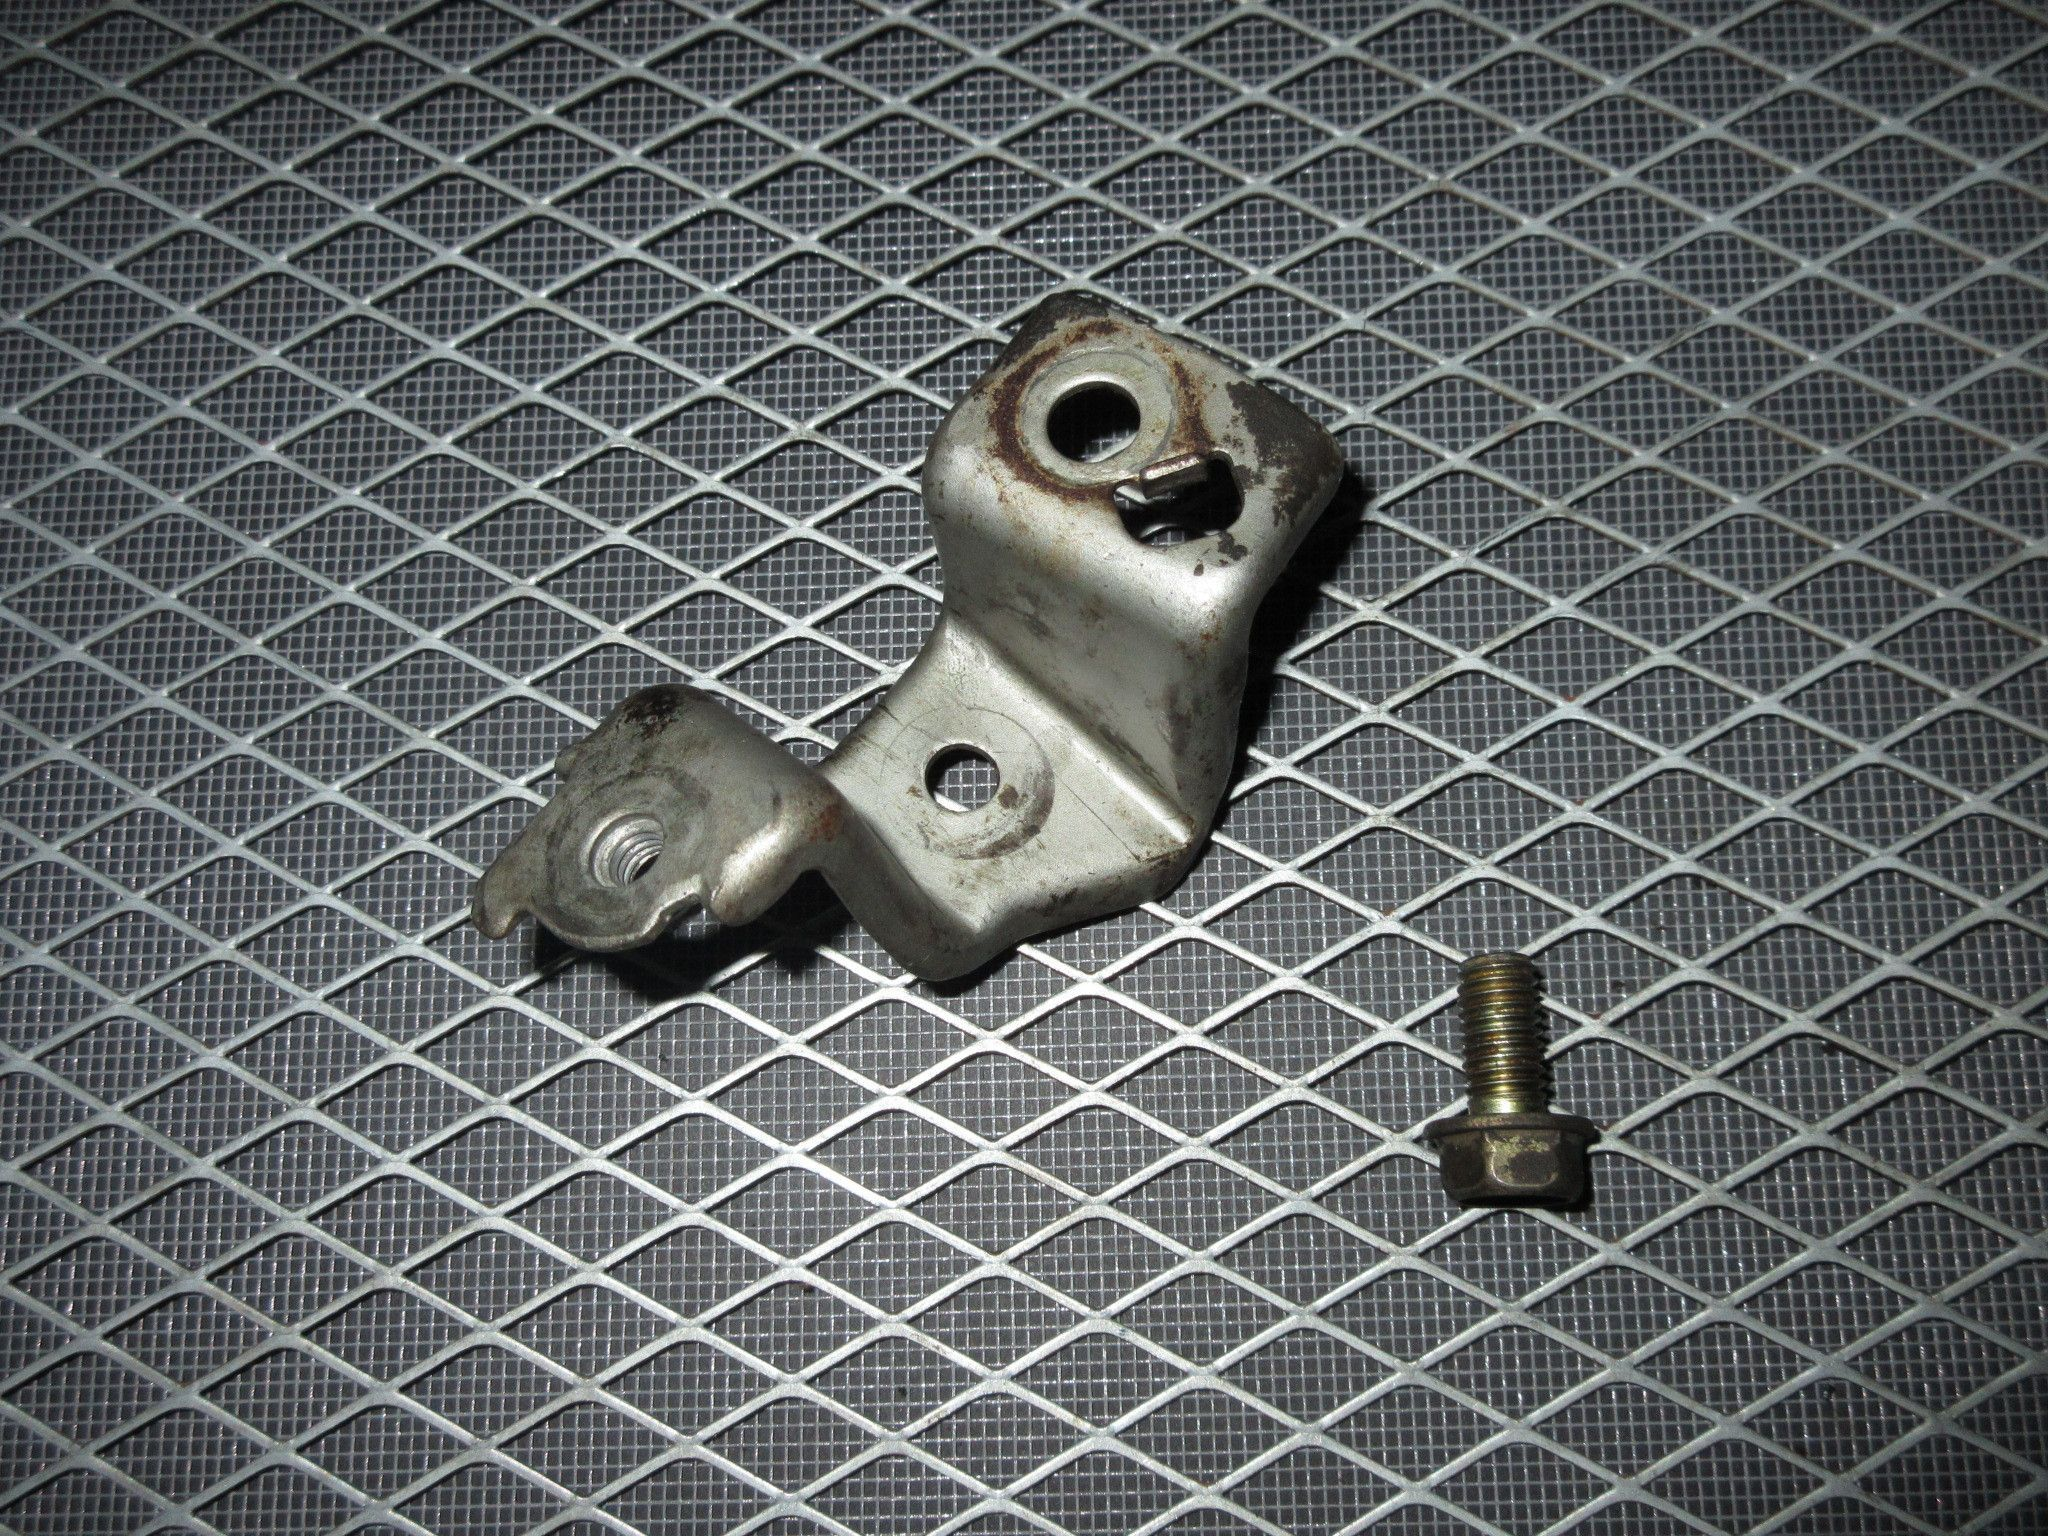 jdm 94 95 96 97 honda accord f22b none vtec engine wiring harness holder bracket [ 2048 x 1536 Pixel ]